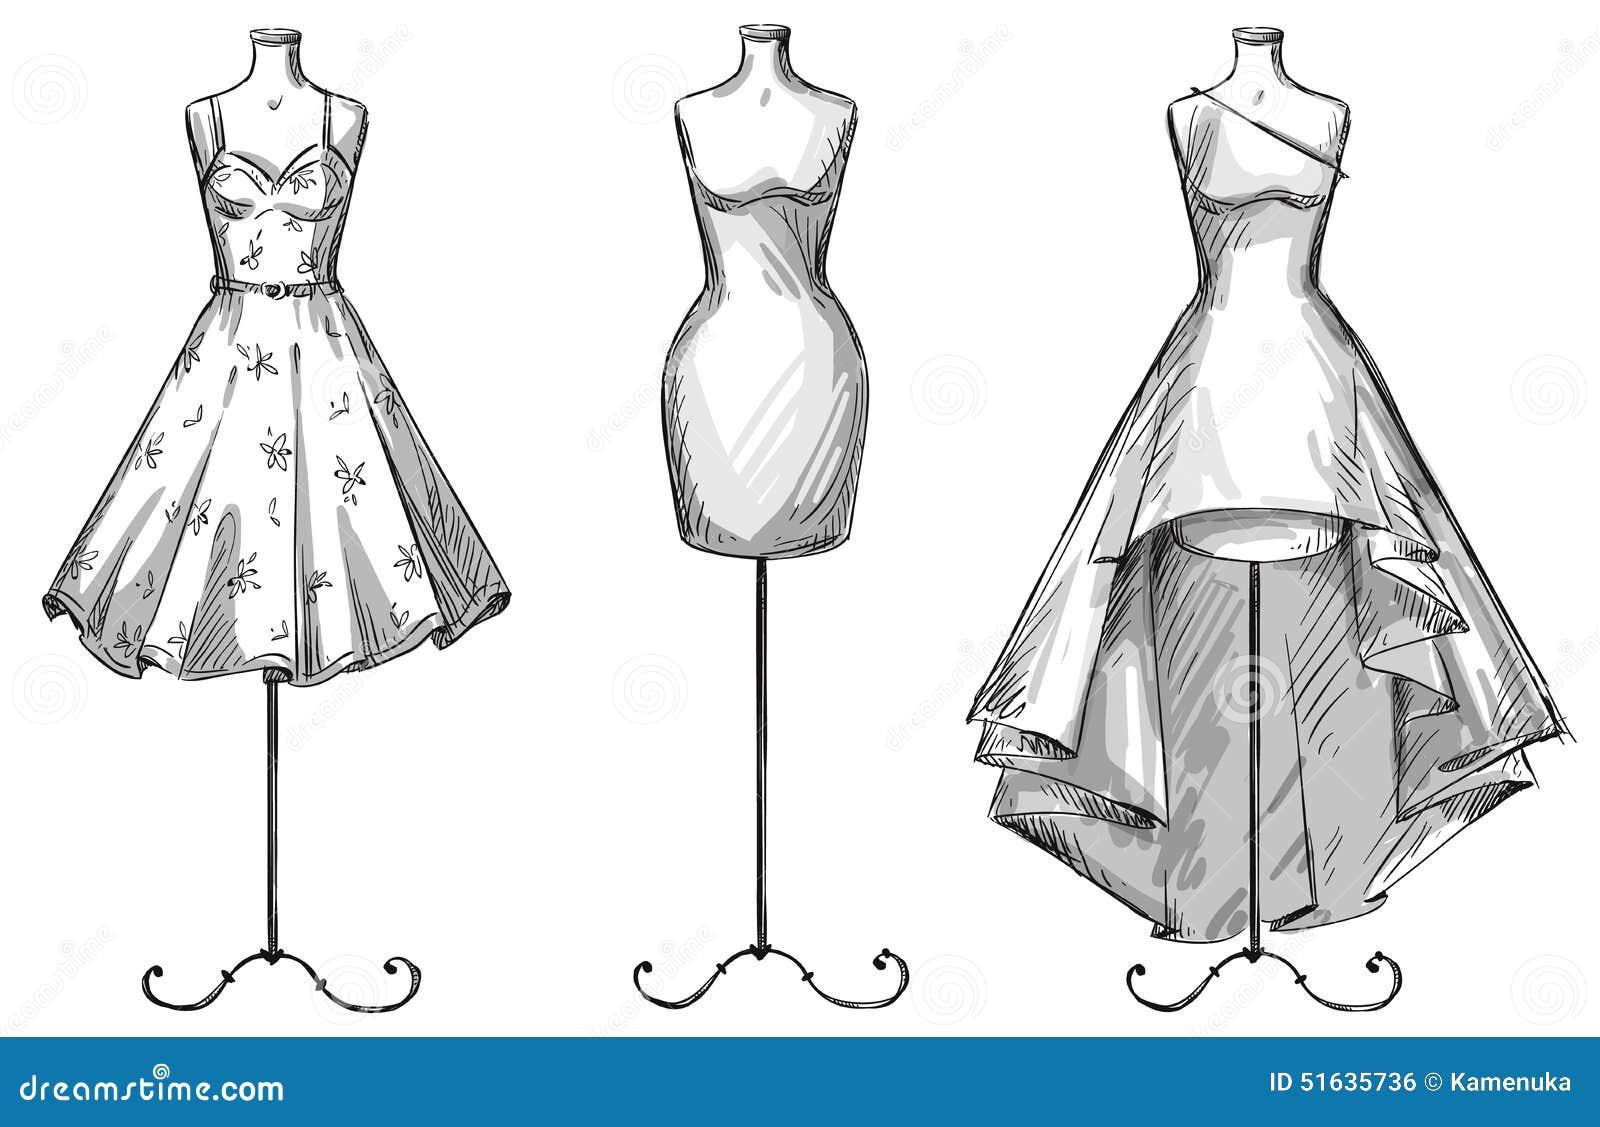 Раскраски платья на манекенах